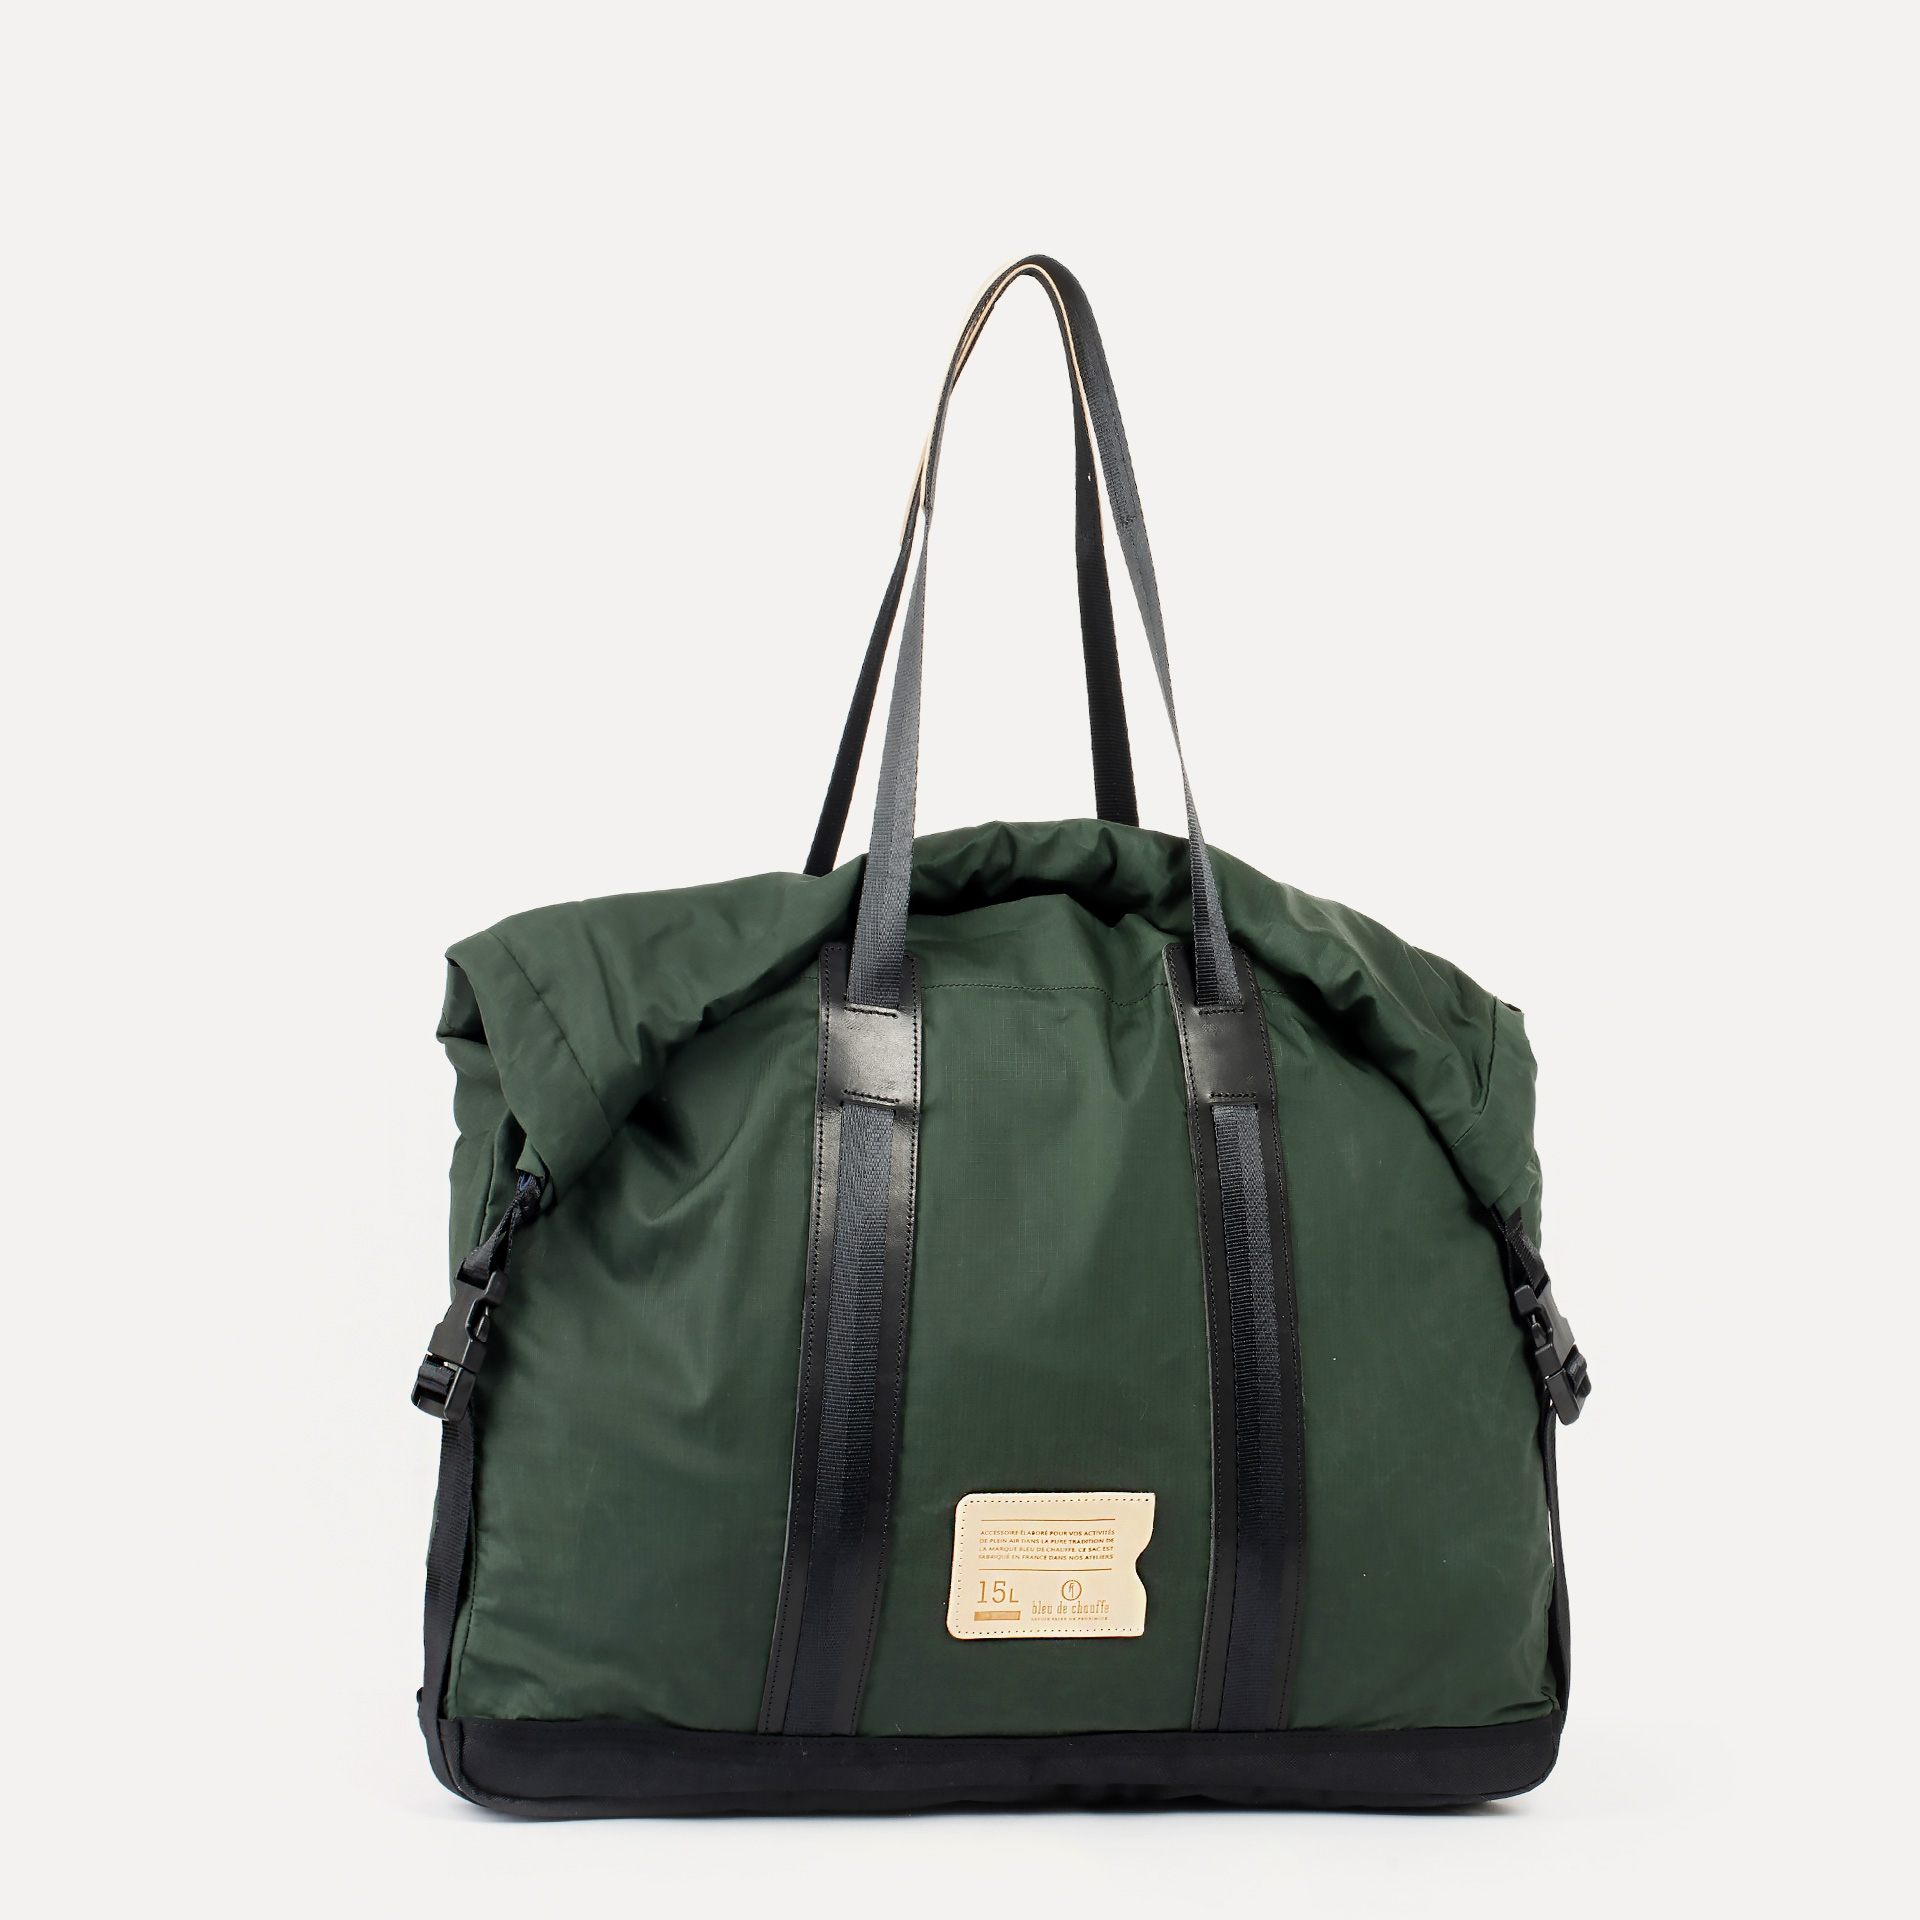 15L Barda Tote bag - Dark Khaki (image n°2)